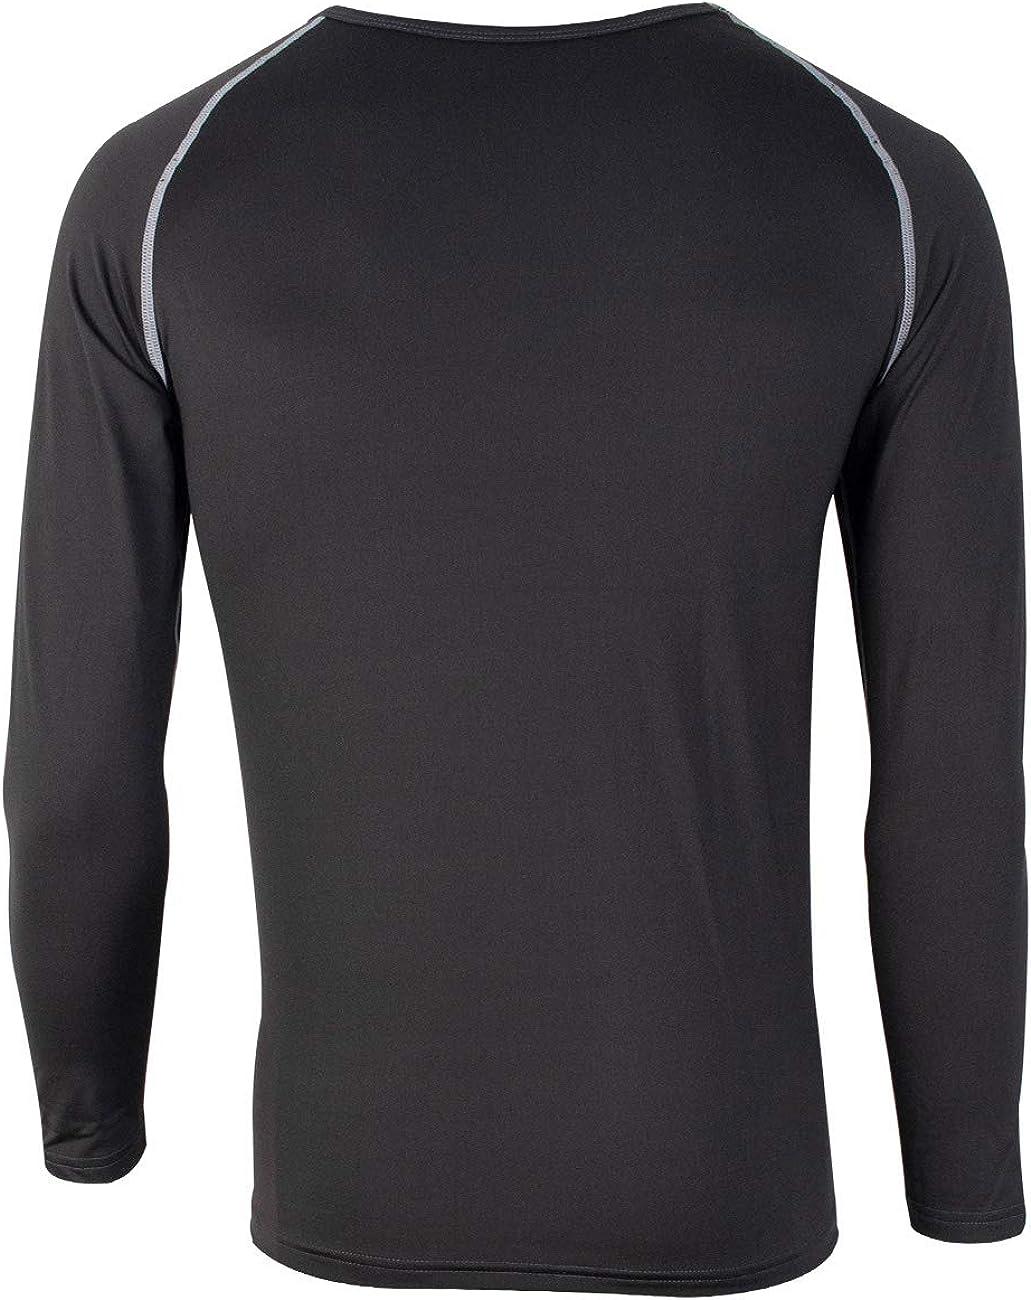 FITEXTREME Mens MAXHEAT Fleece Lined Performance Long Johns Active Underwear